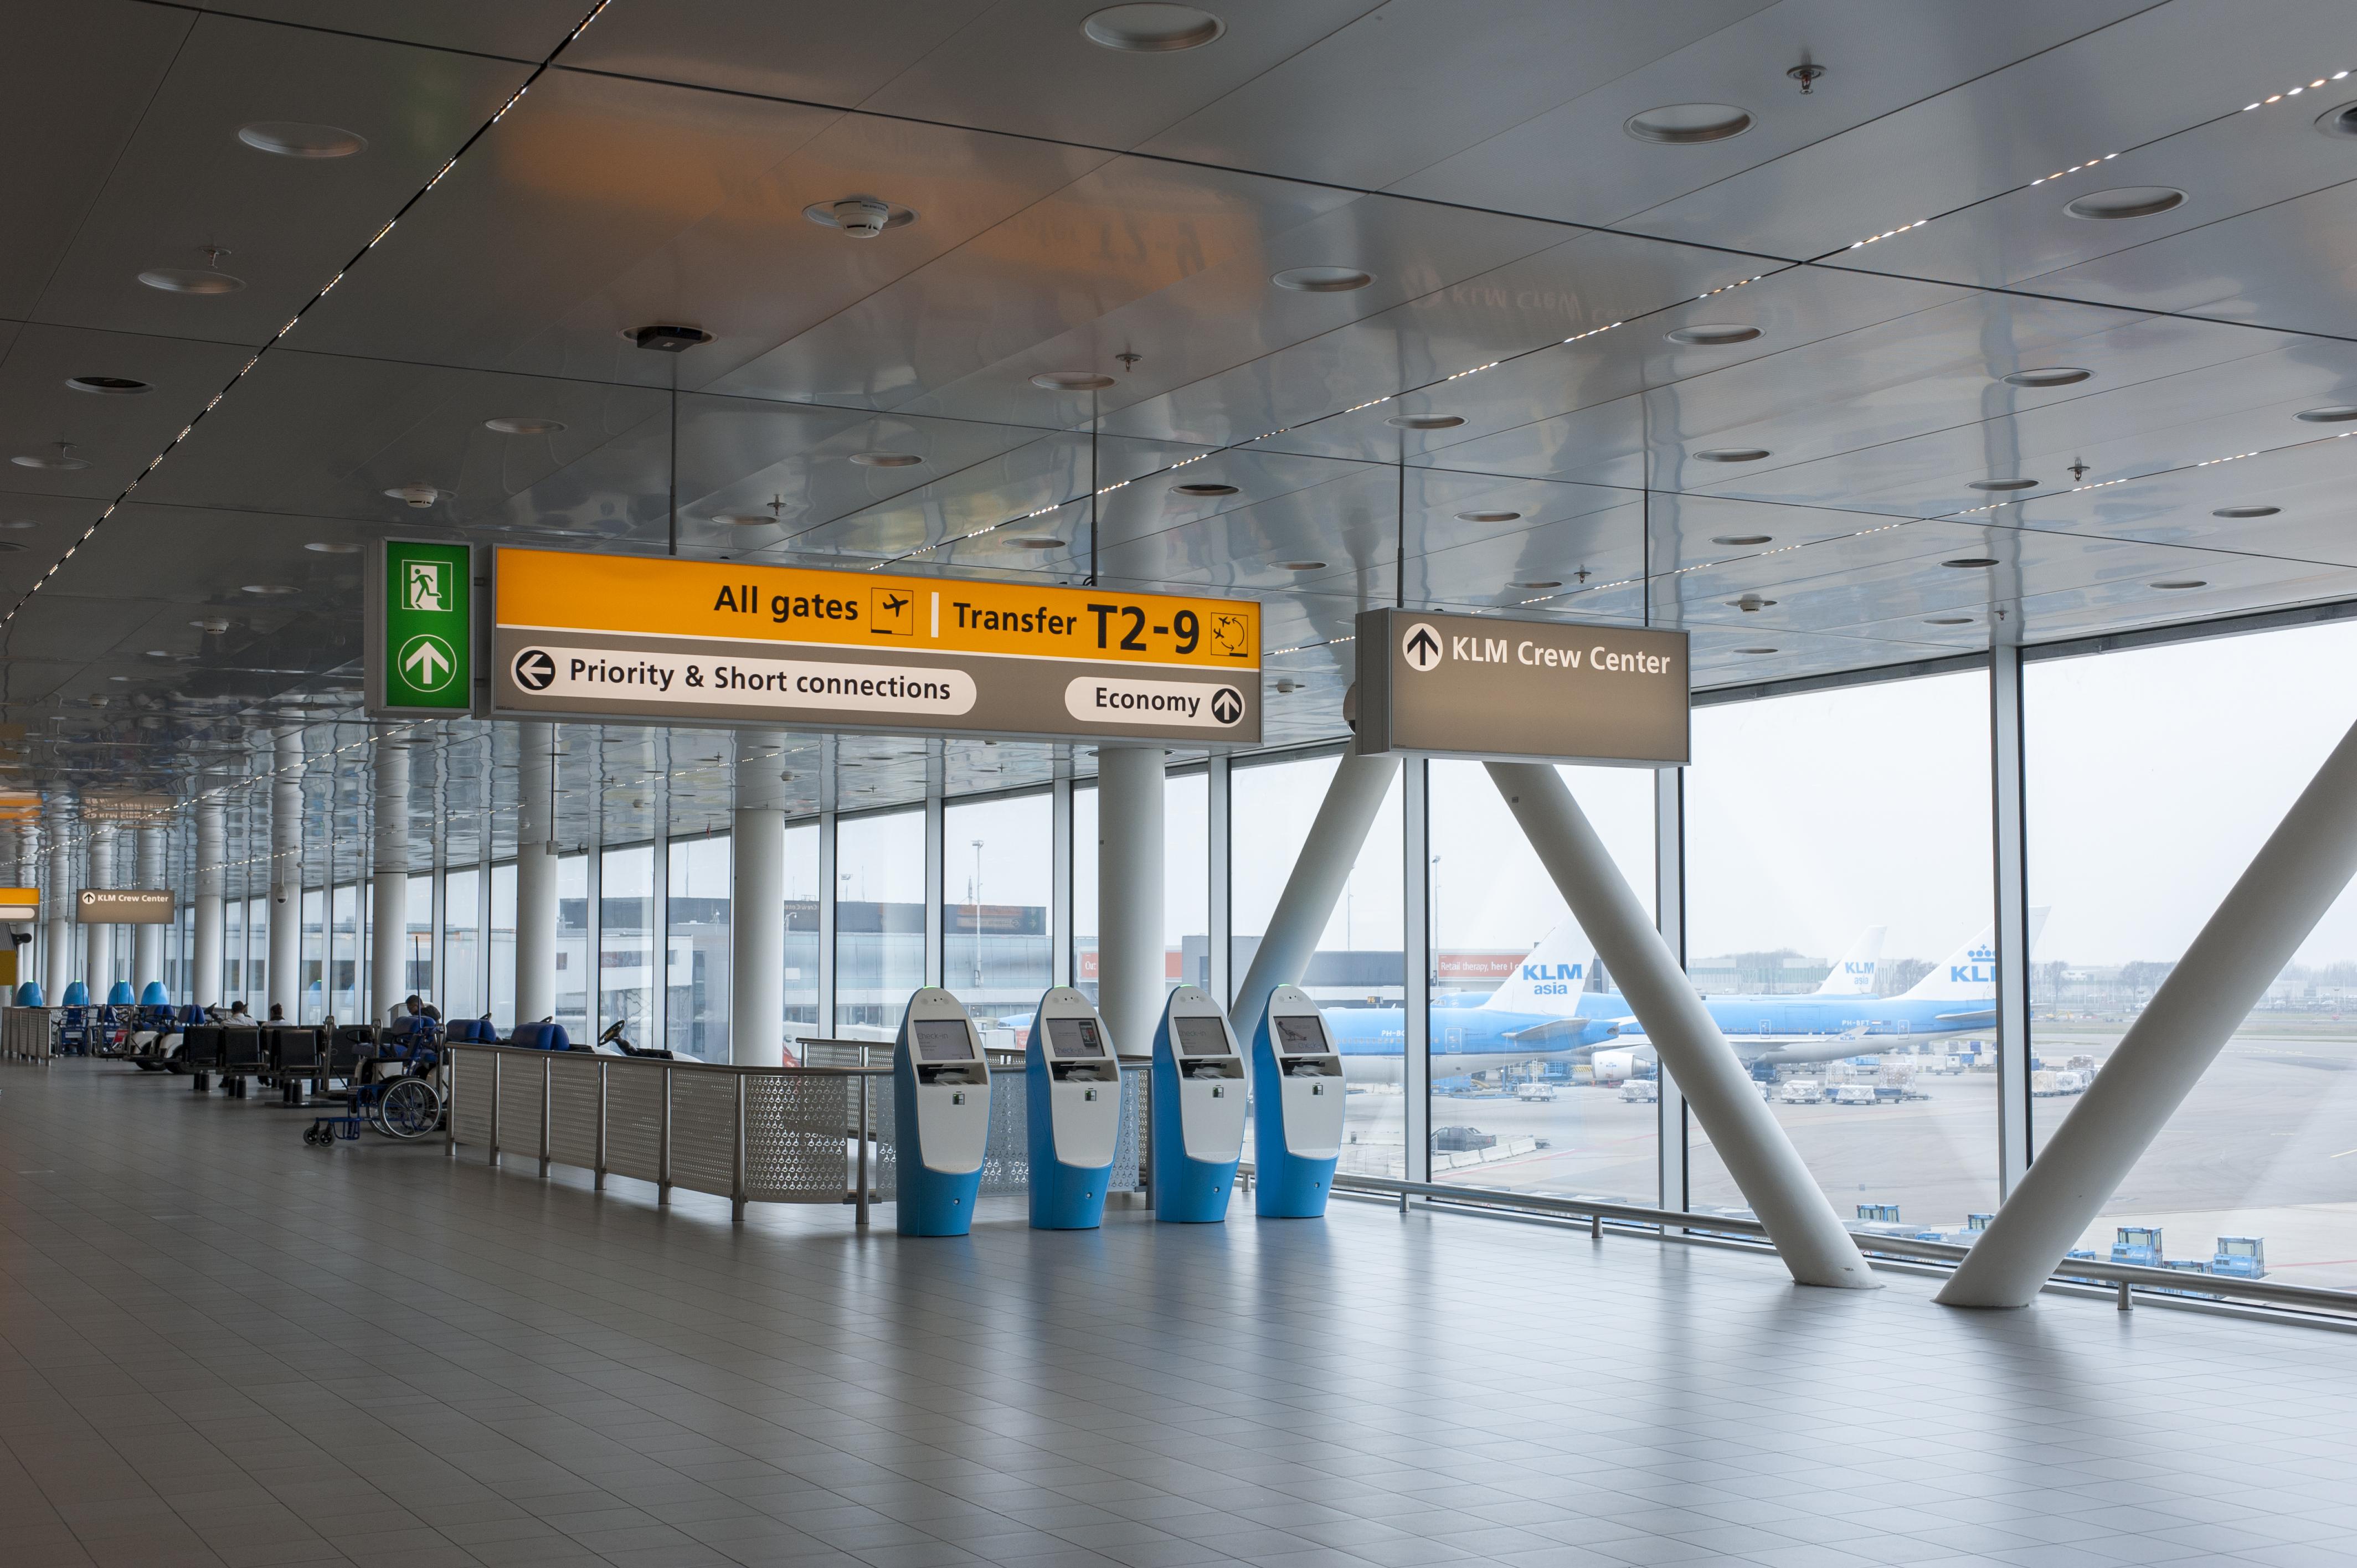 Wayfinding Amsterdam Airport Schiphol